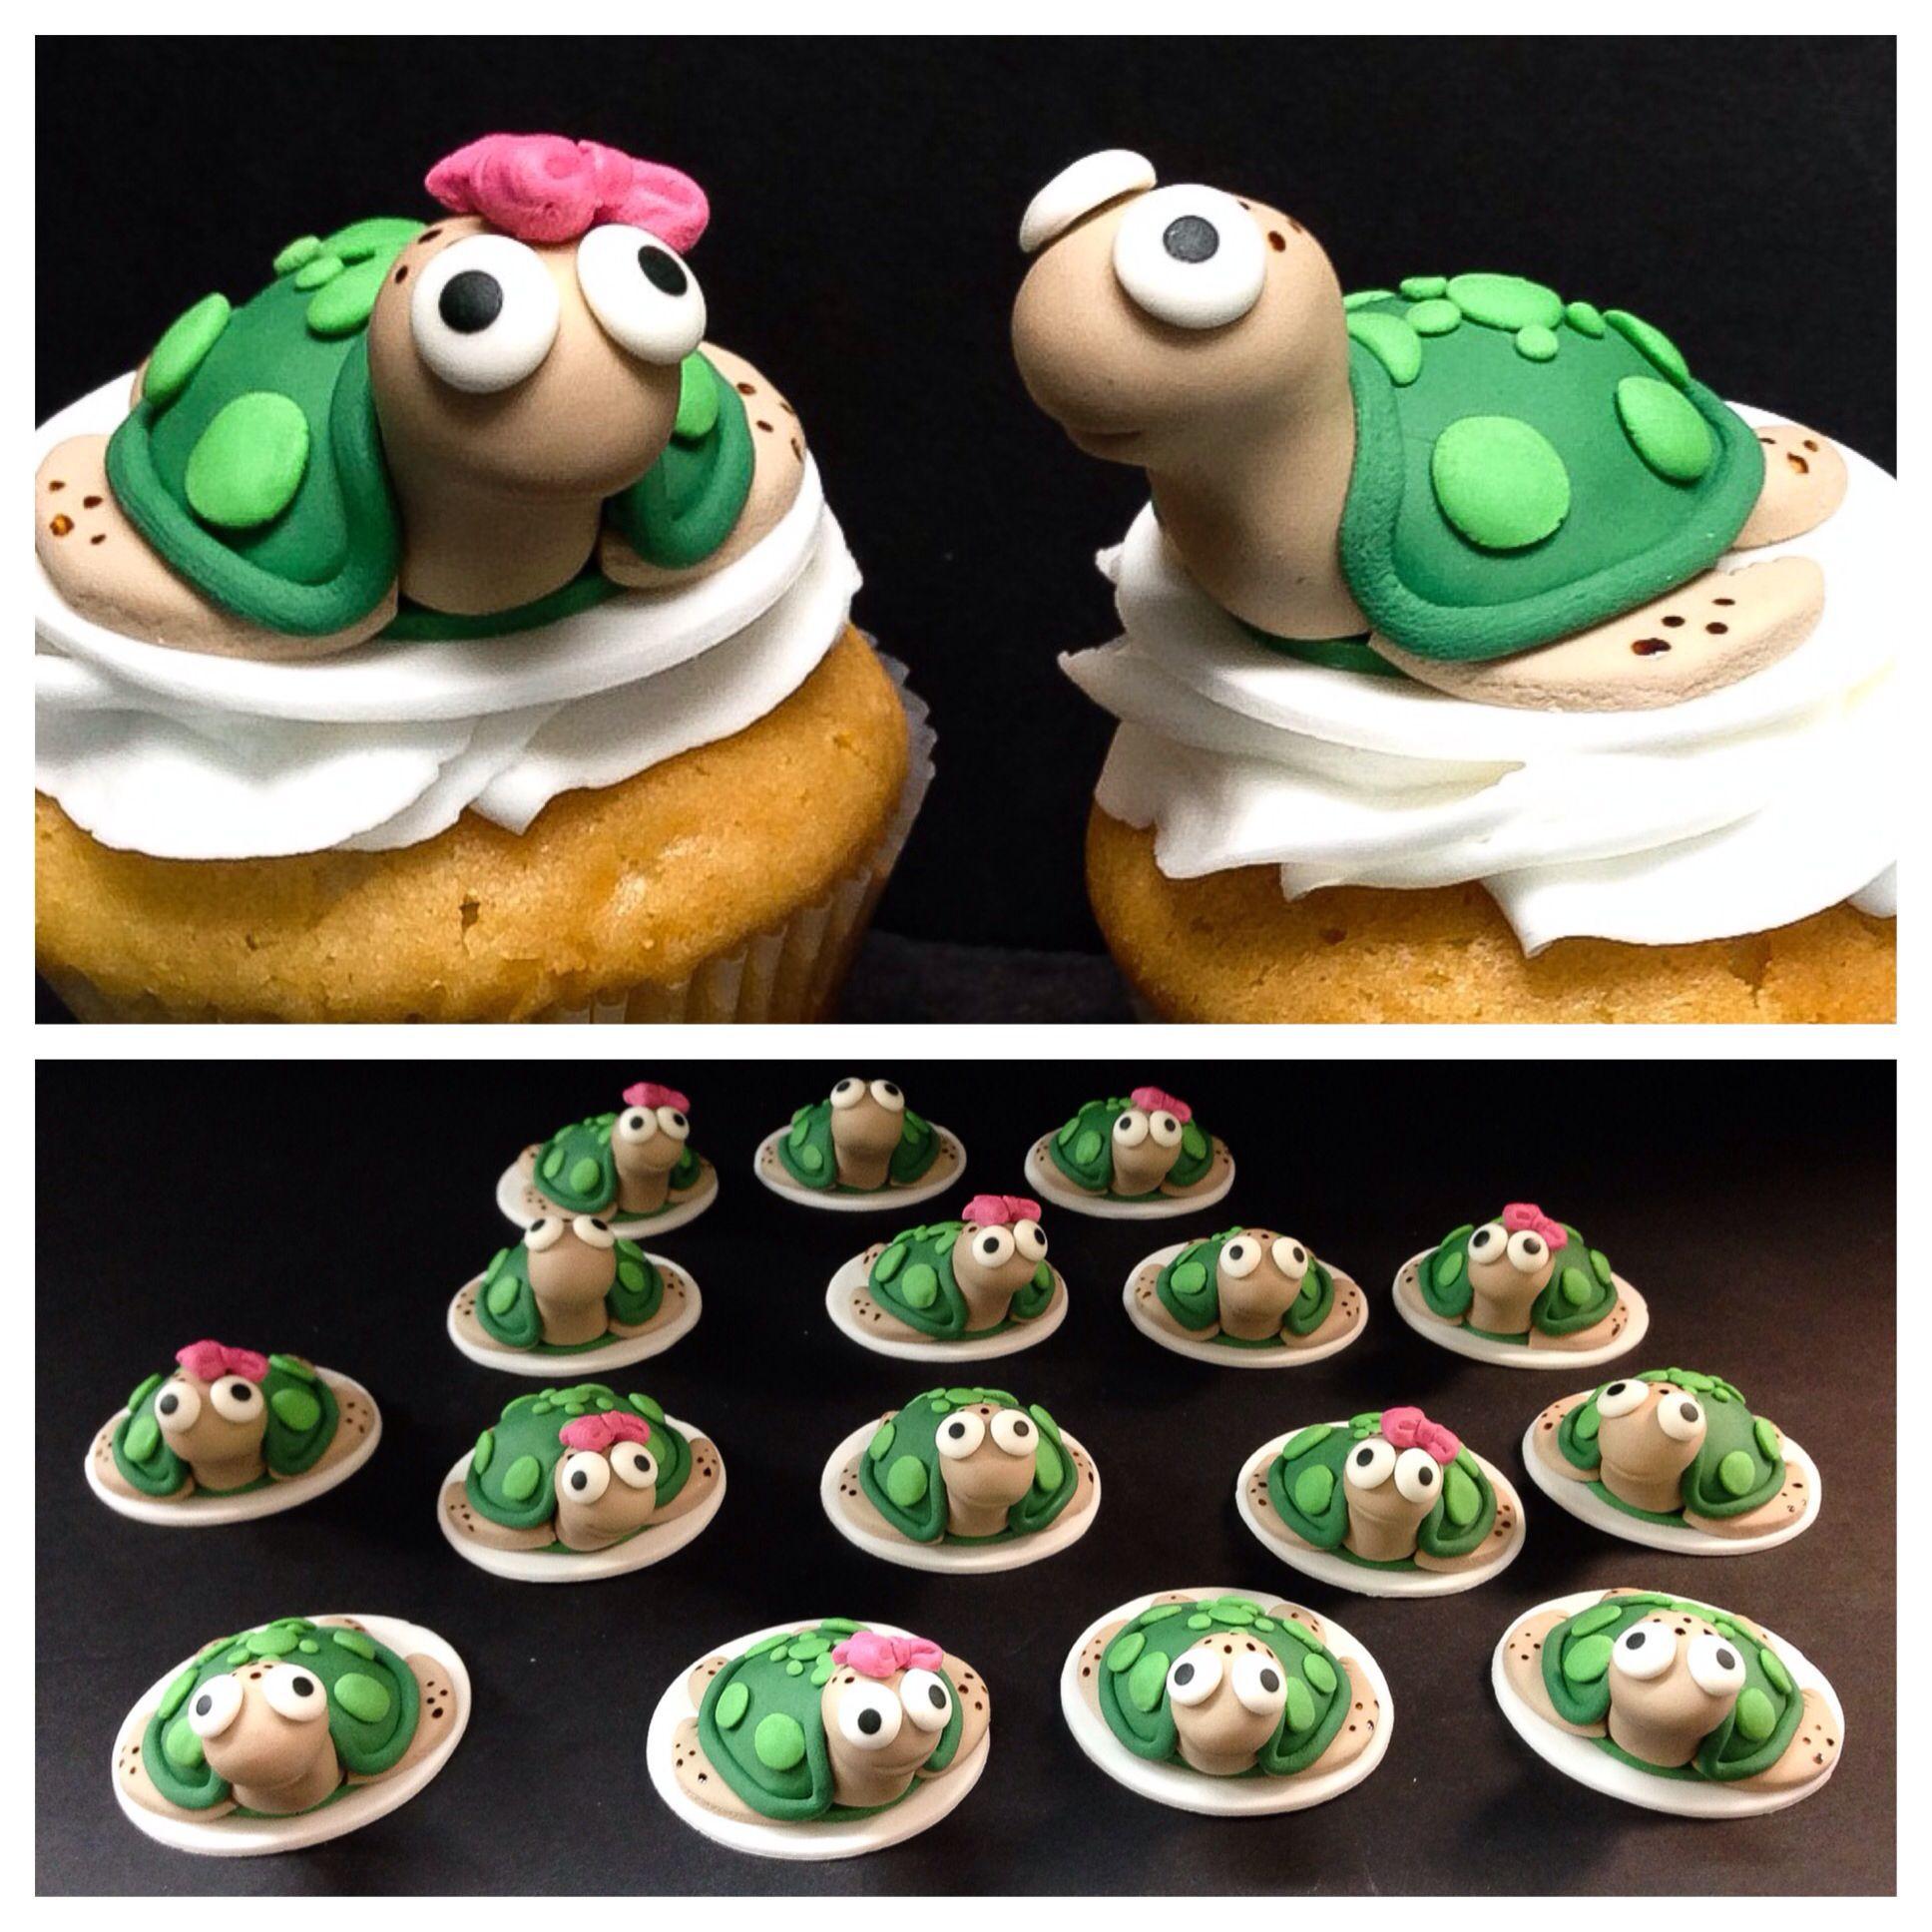 Cupcakes Winter Park  Turtle cupcakes from Sprinkles Custom Cakes in Winter Park